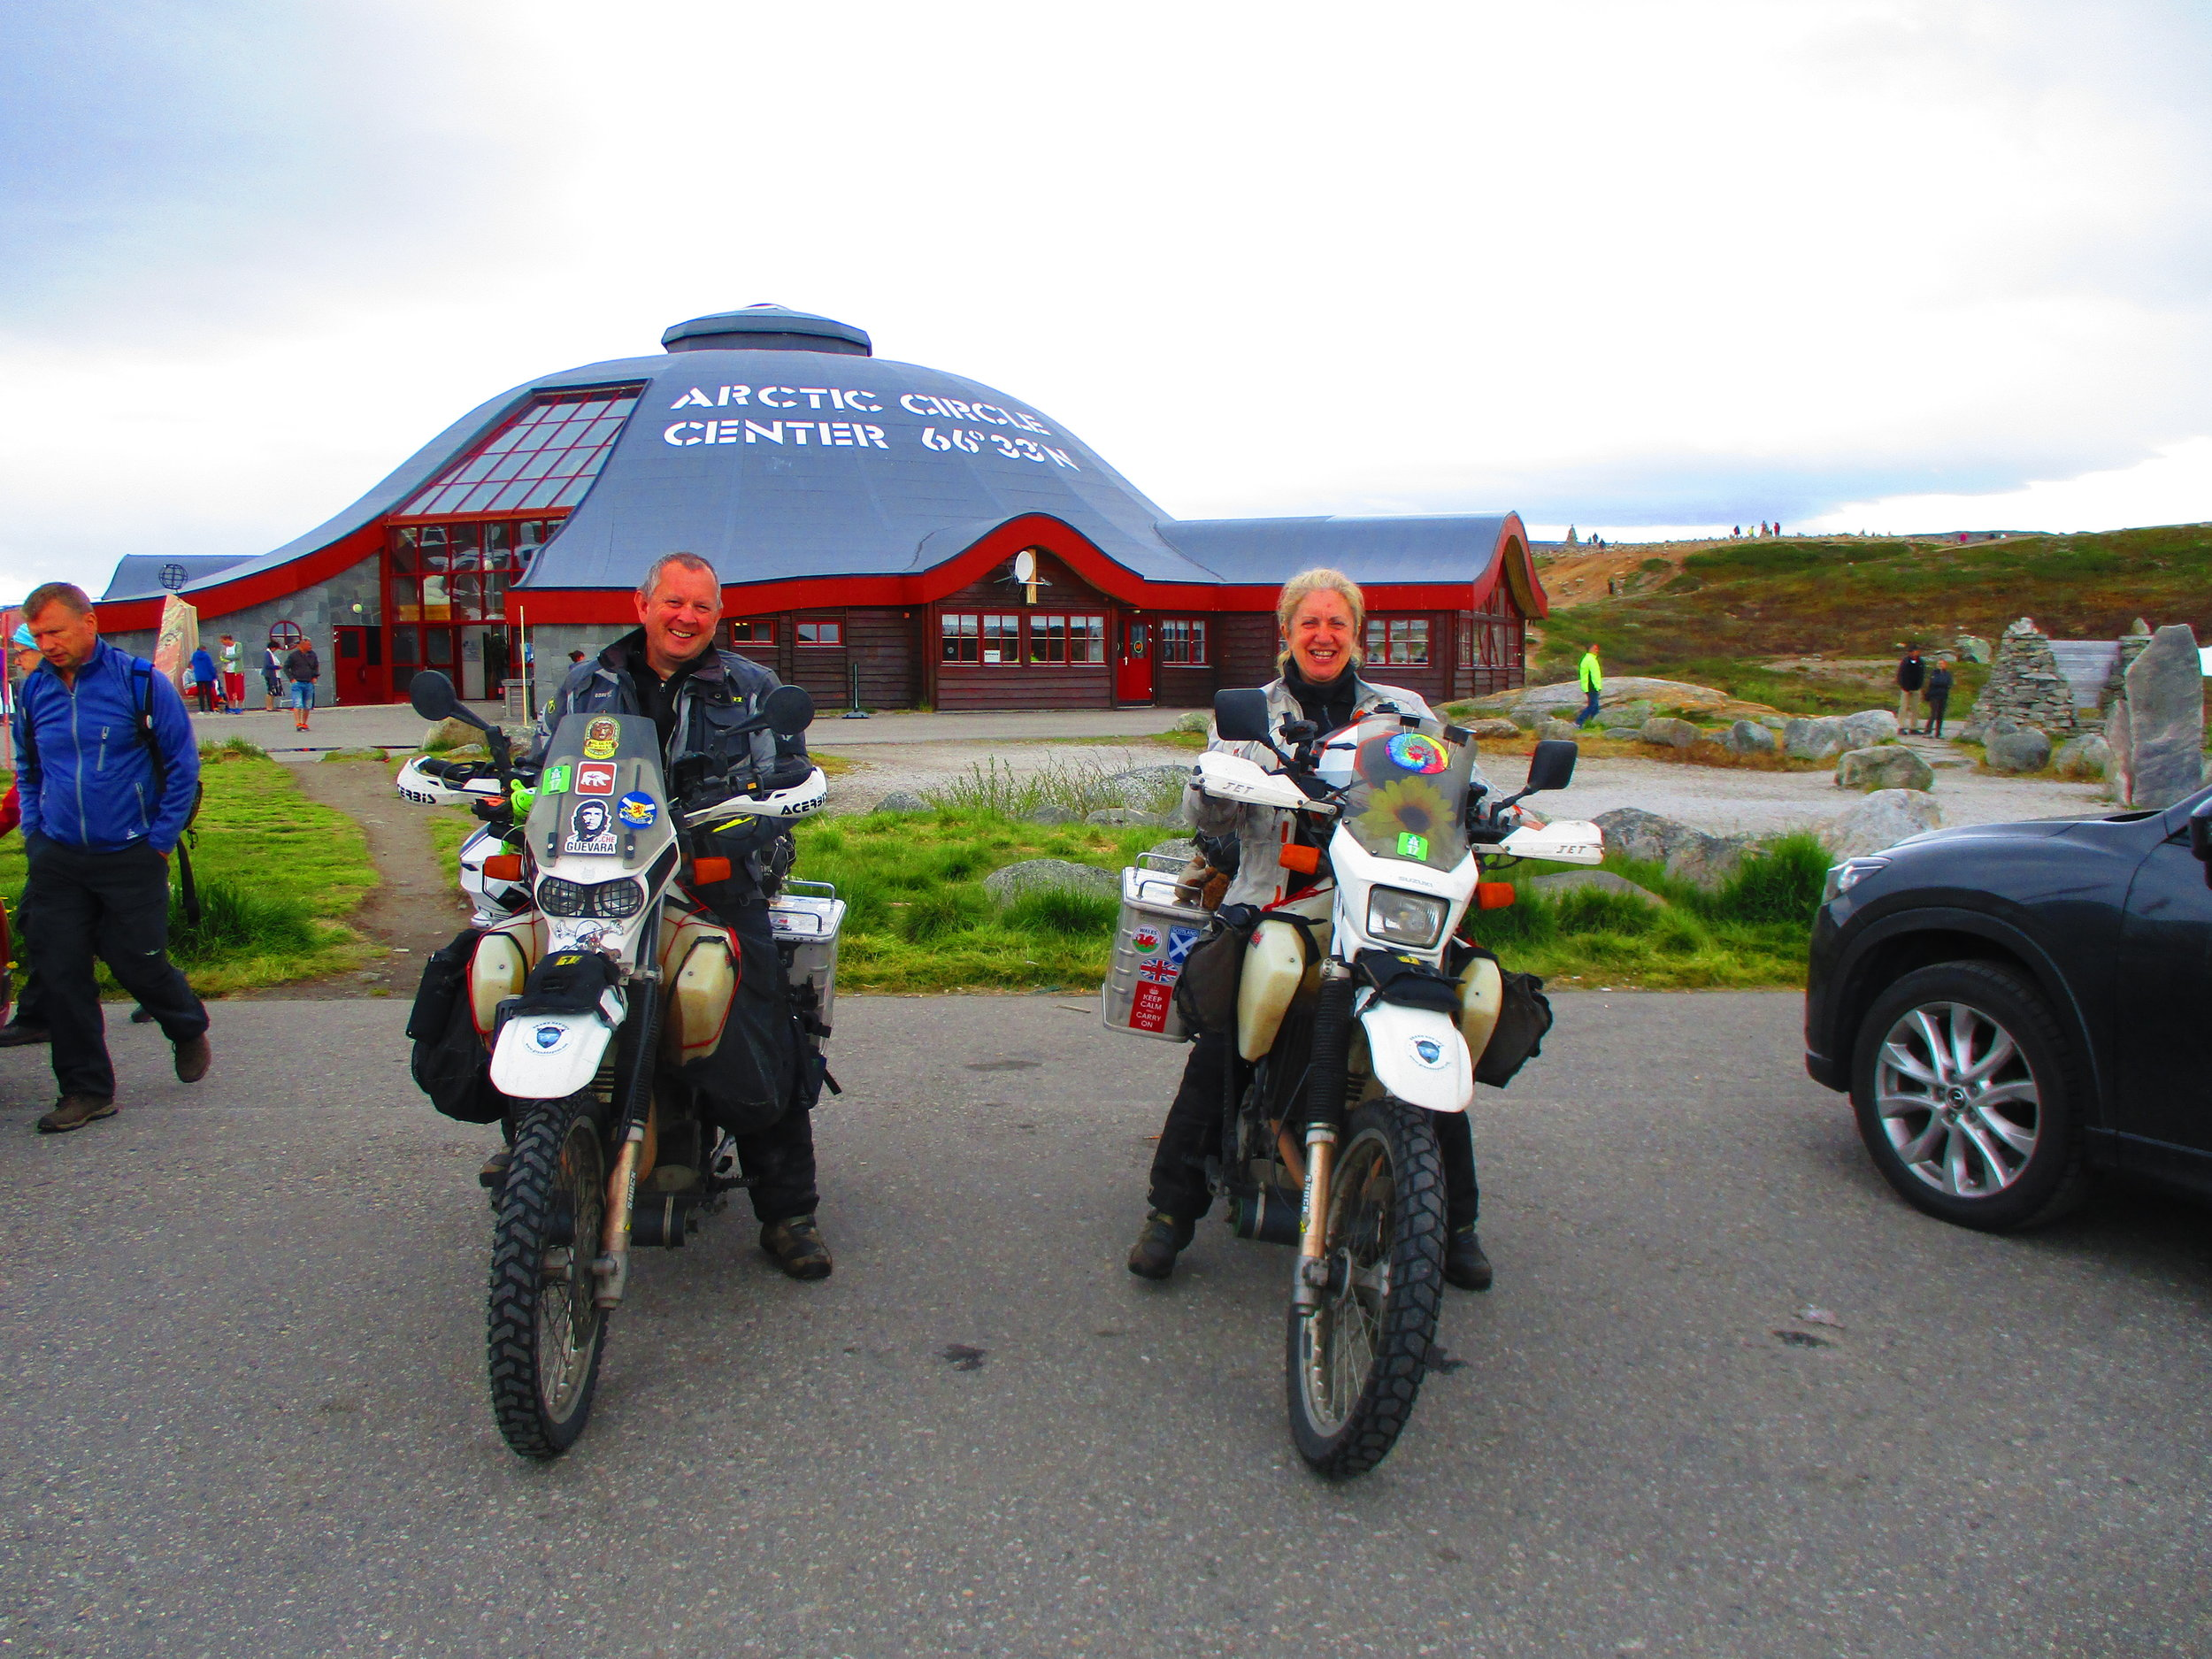 Arctic Circle line in Norway